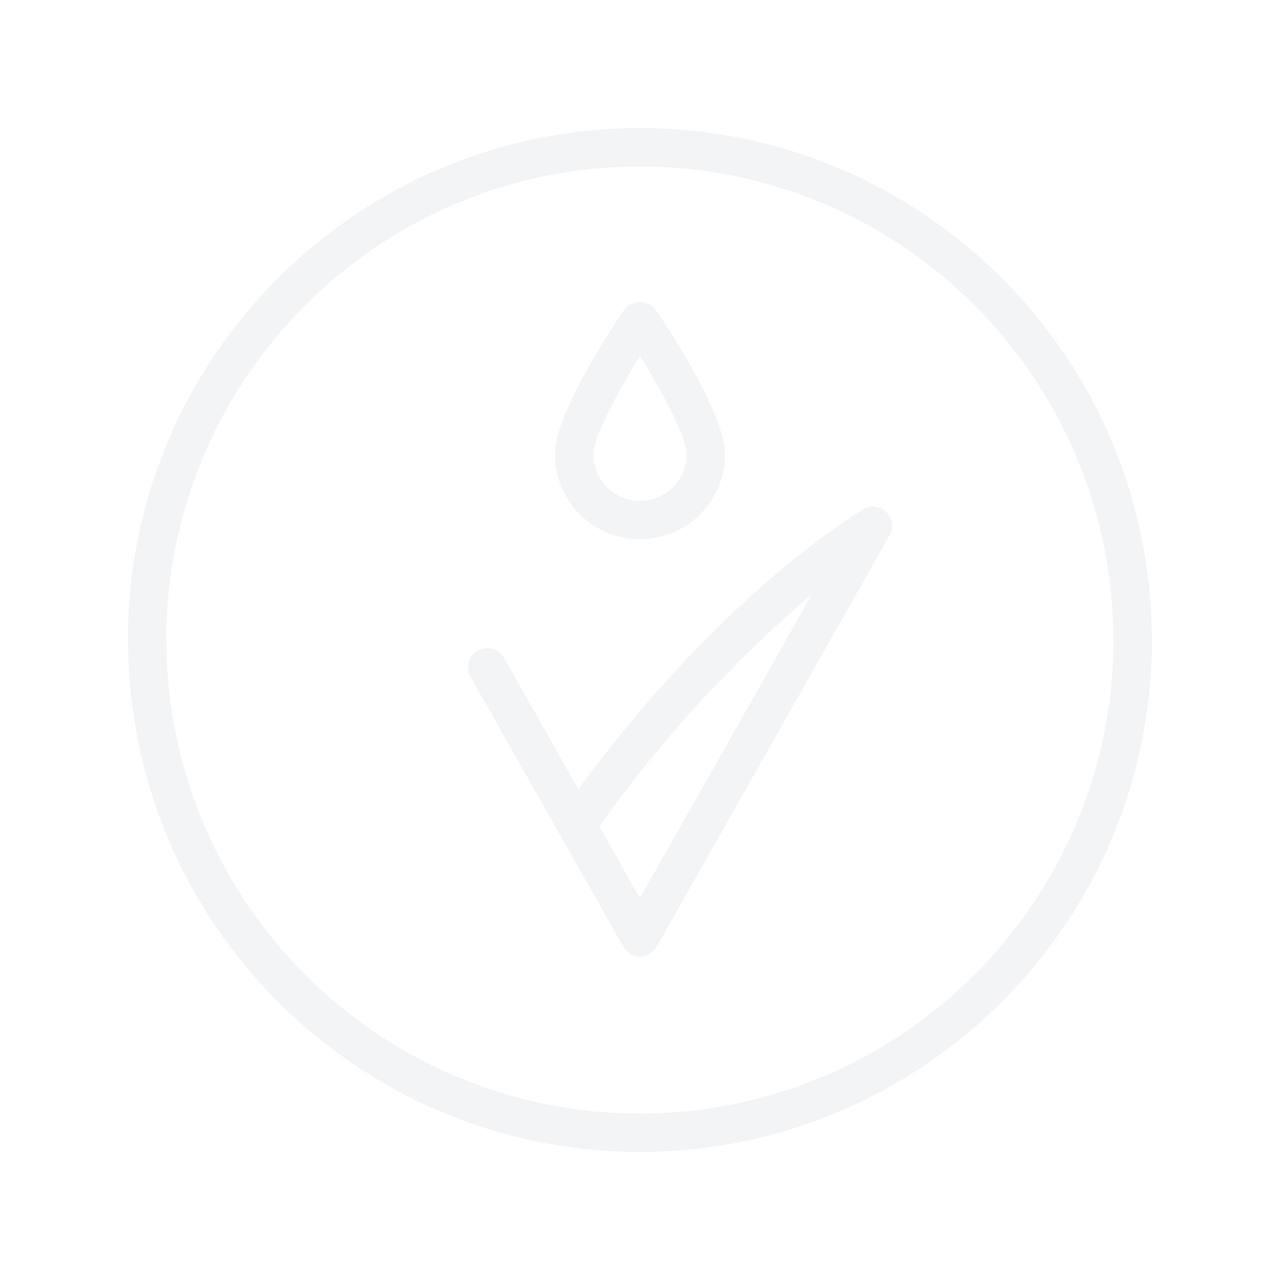 CLINIQUE Beyond Perfecting Powder Foundation+Concealer No.8 Golden Neutral 14.5g